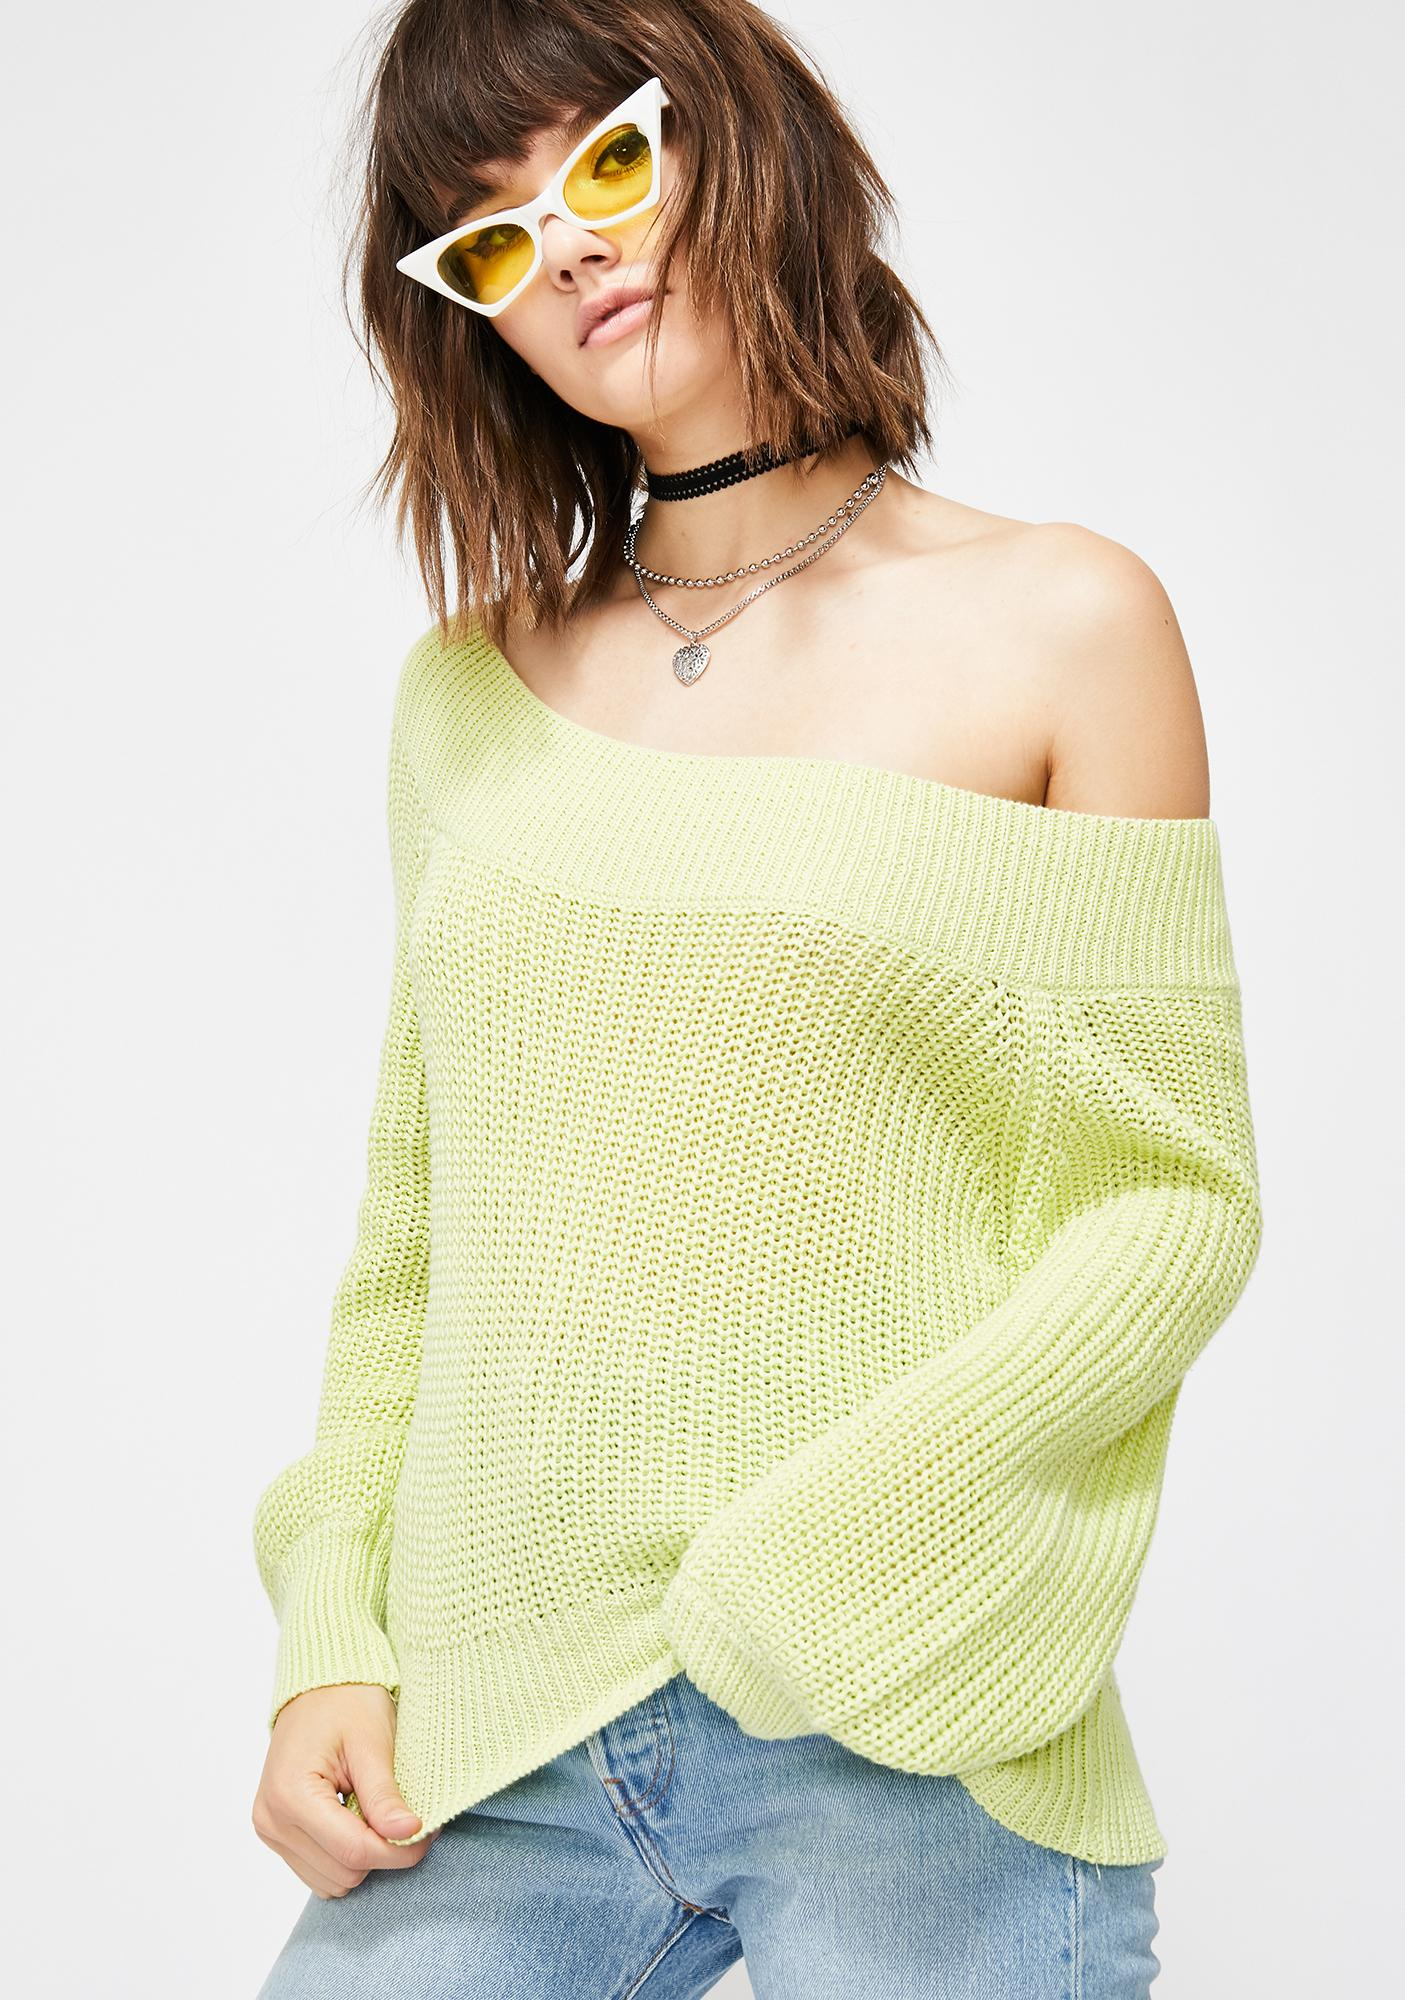 Get Dazed Knit Sweater